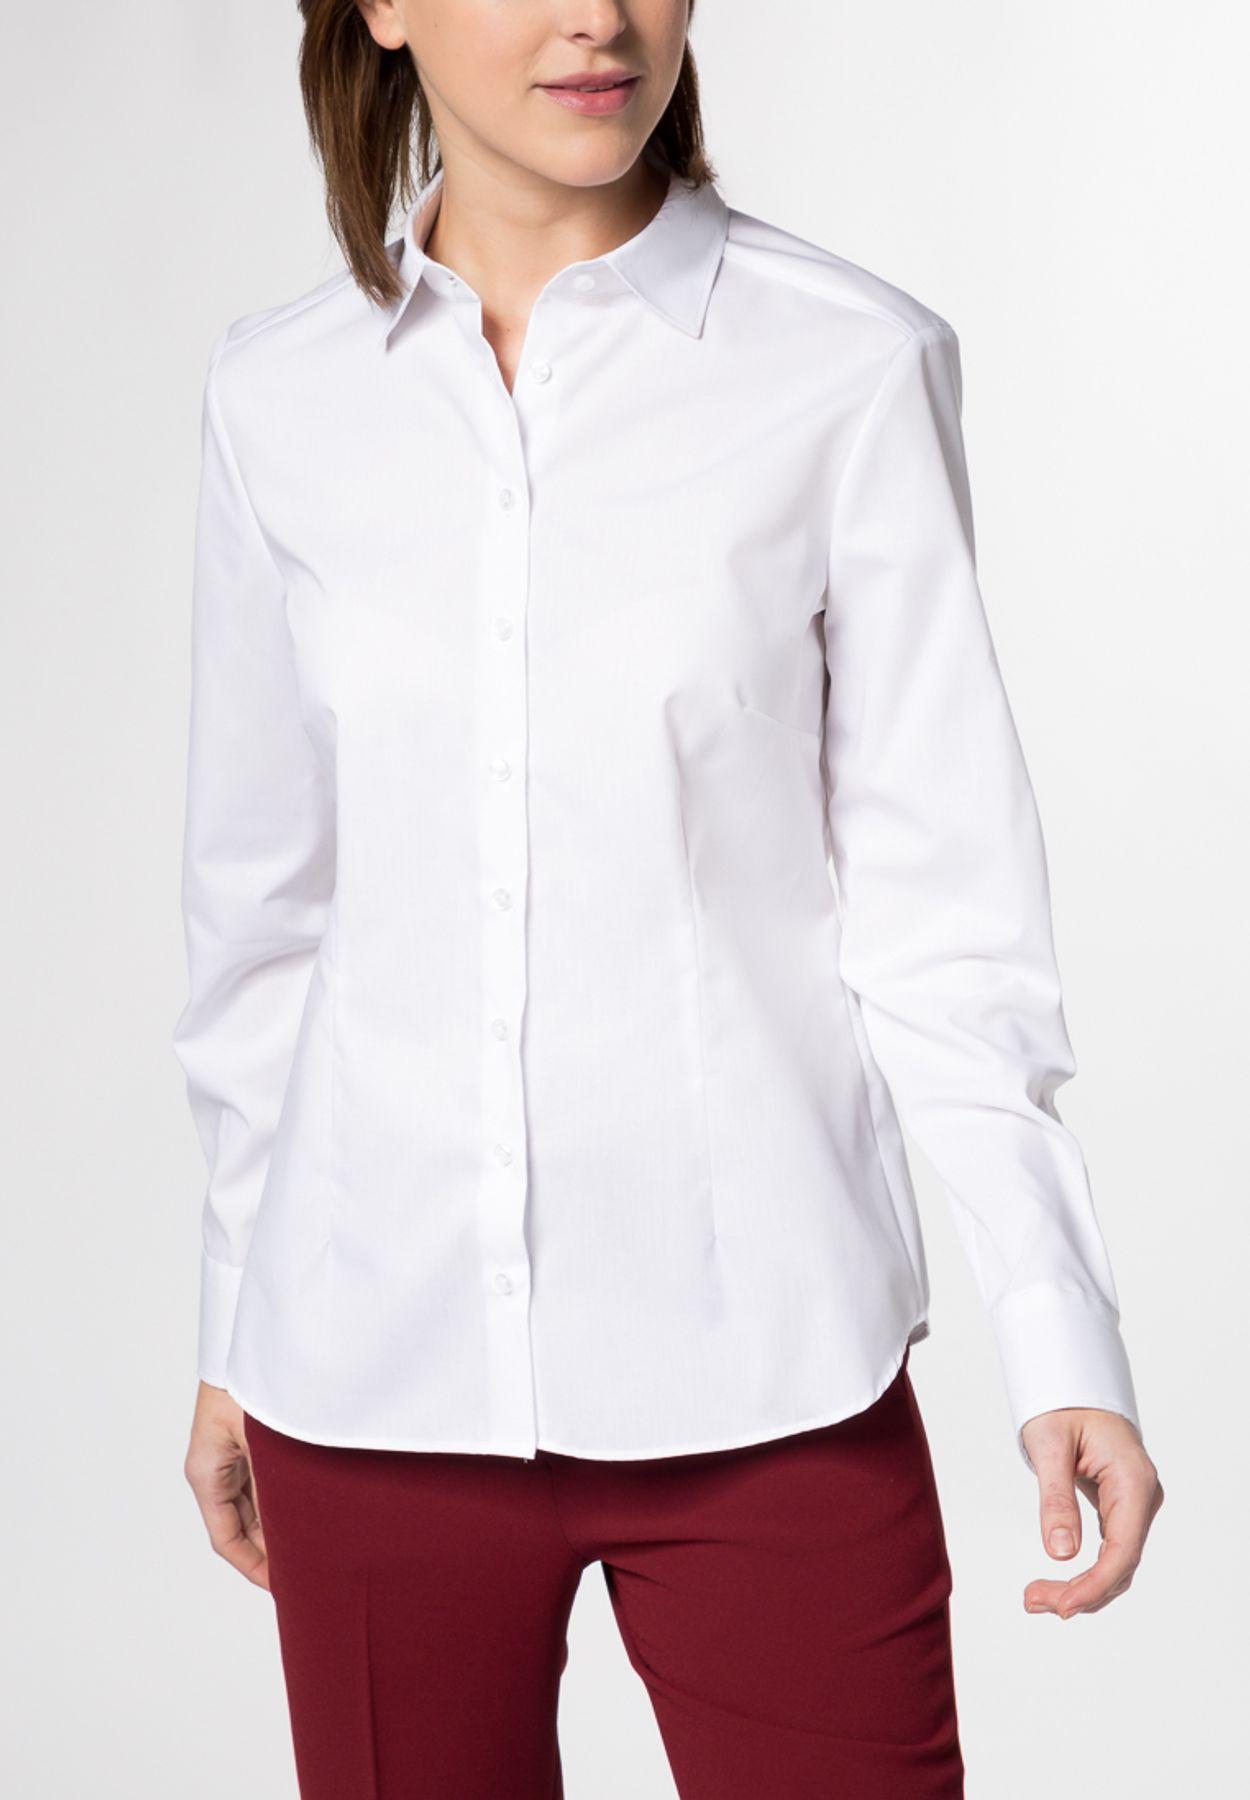 Eterna -  Comfort-Fit - Damen Langarm-Bluse Modern Classic Unifarben  (5220 D790) – Bild 2